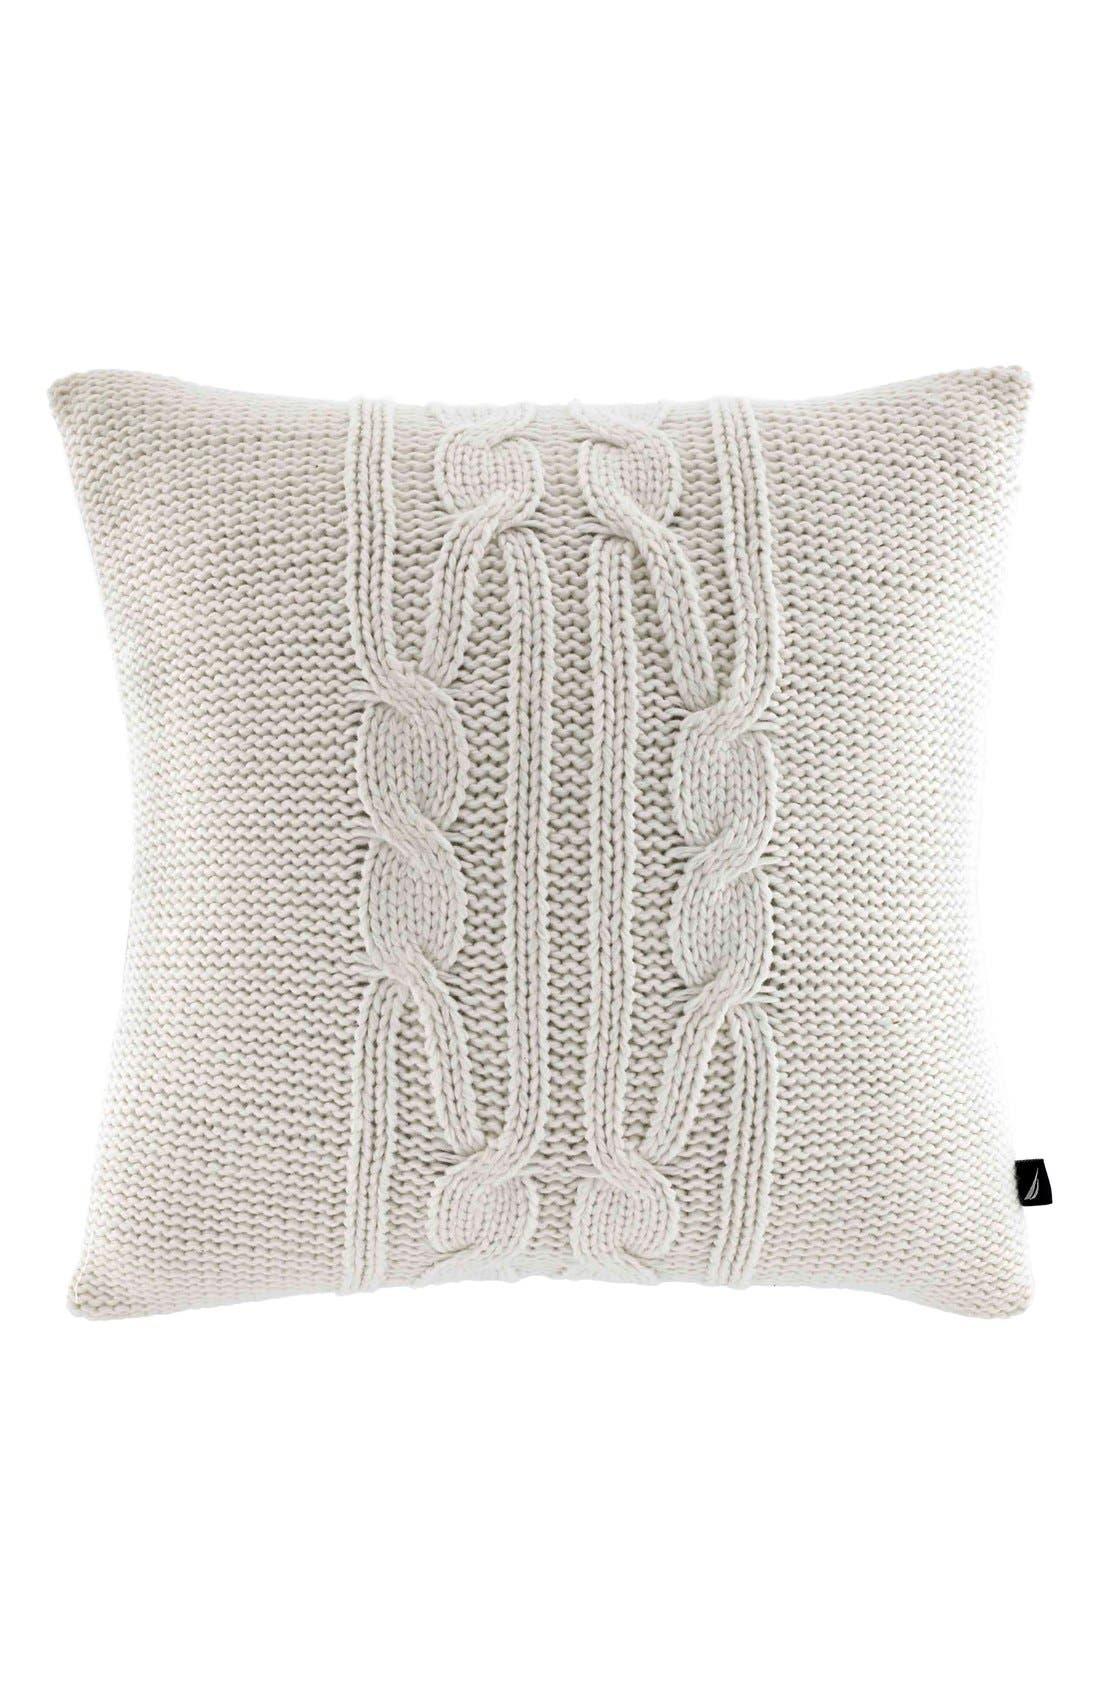 'Seaward' Knit Pillow,                         Main,                         color, 104